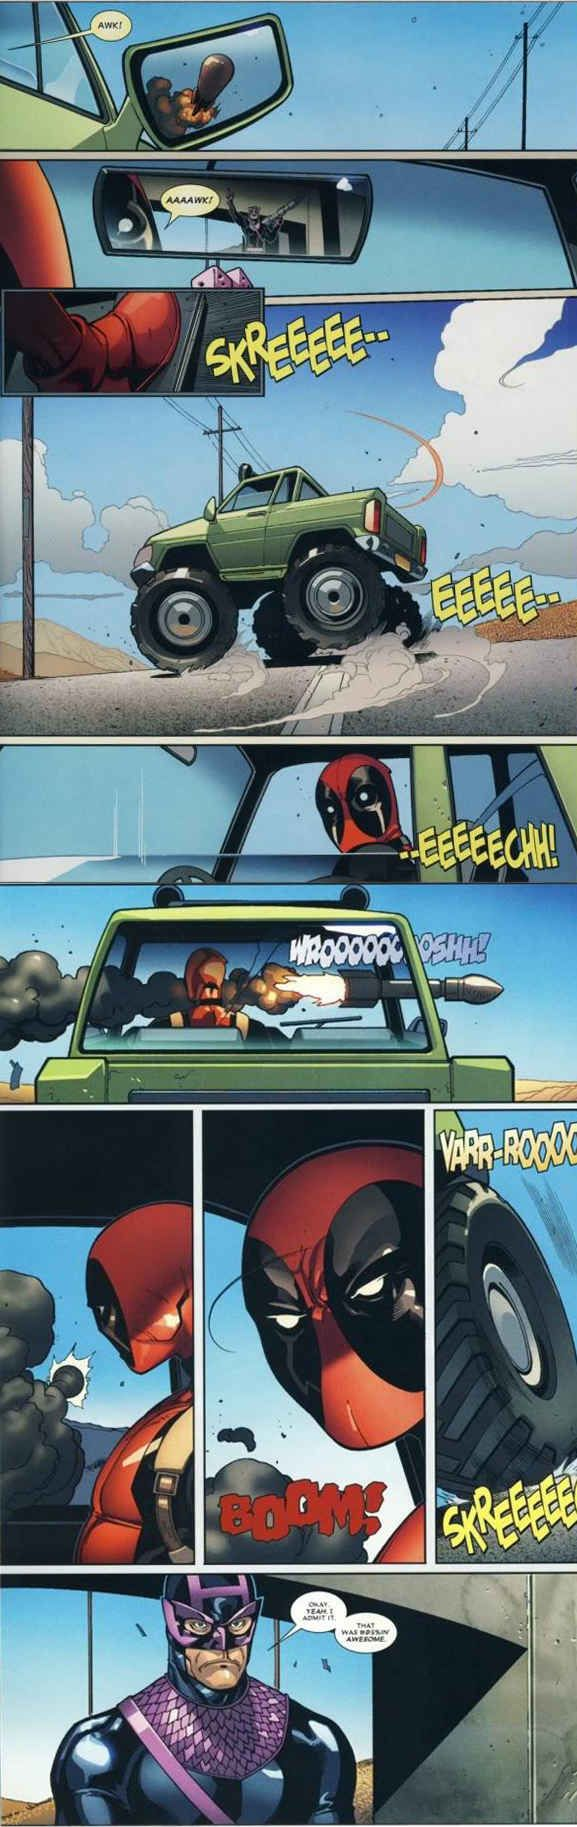 23 Reasons Everyone Should Love Deadpool - BuzzFeed Mobile